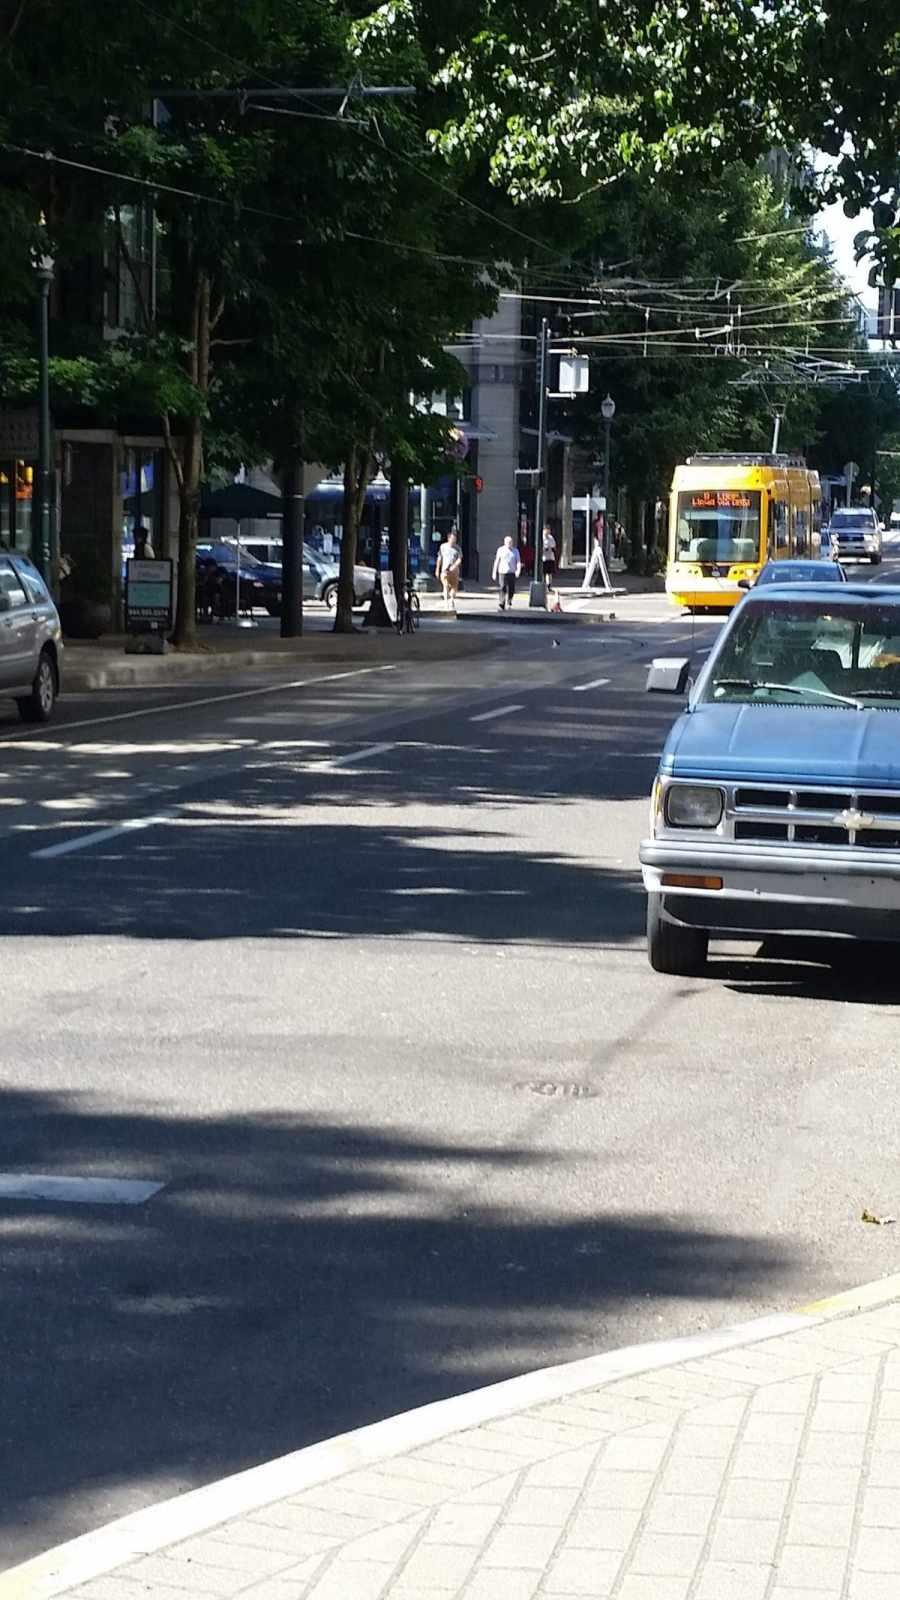 Portland Street Arriving